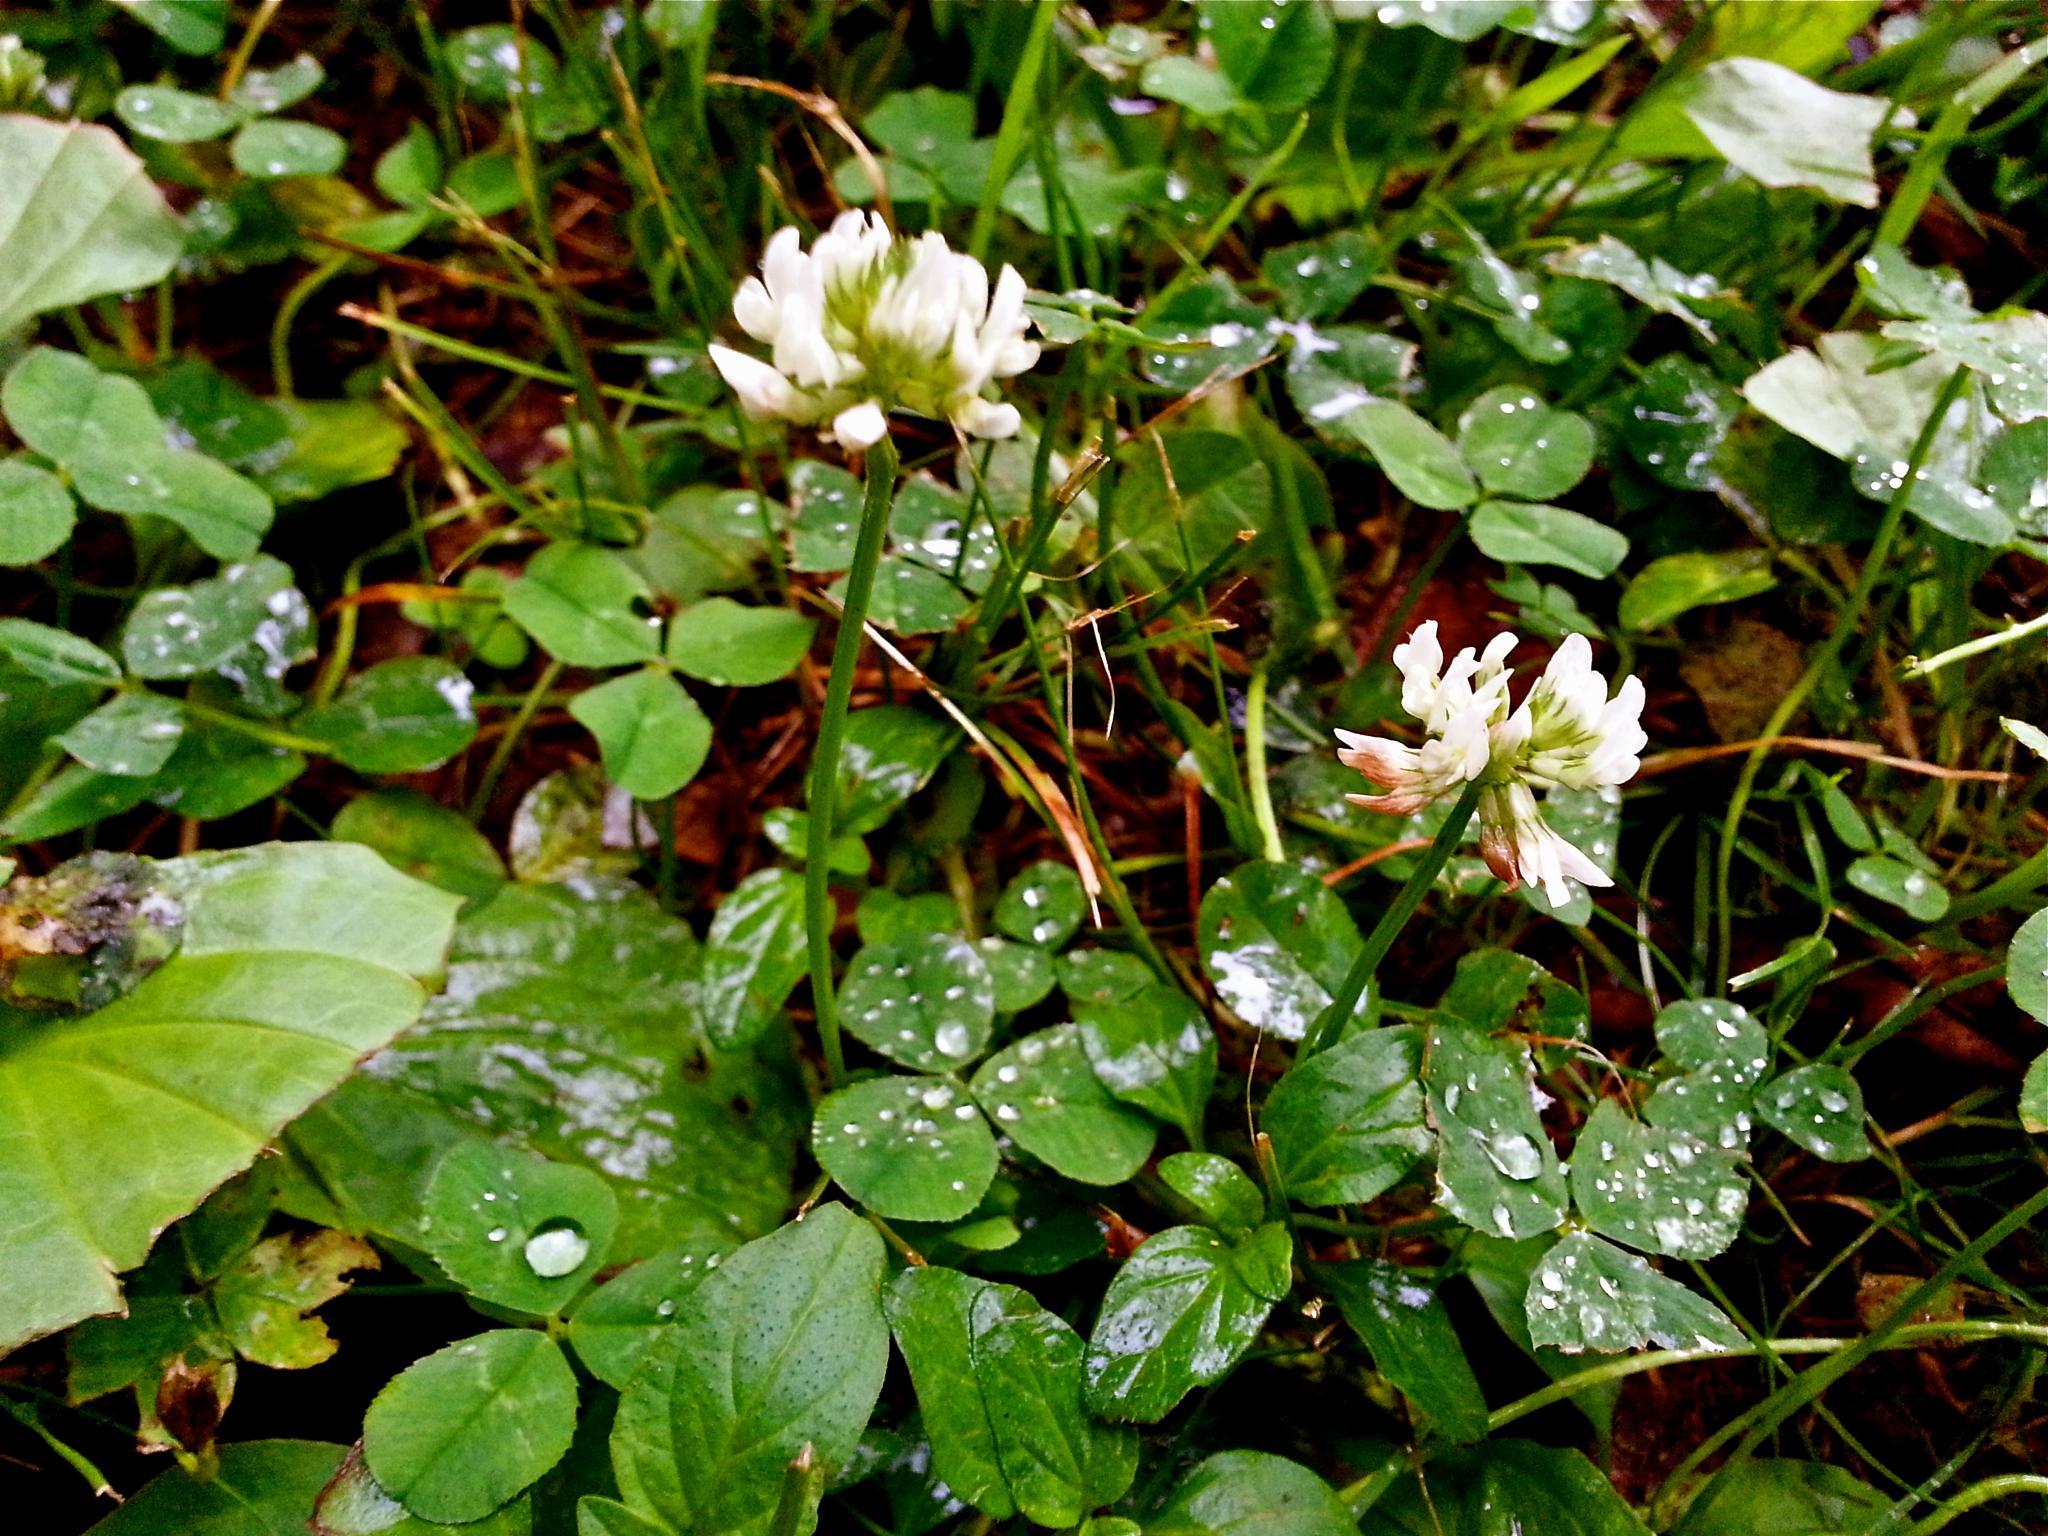 Raindrops and Clovers by kiralysha